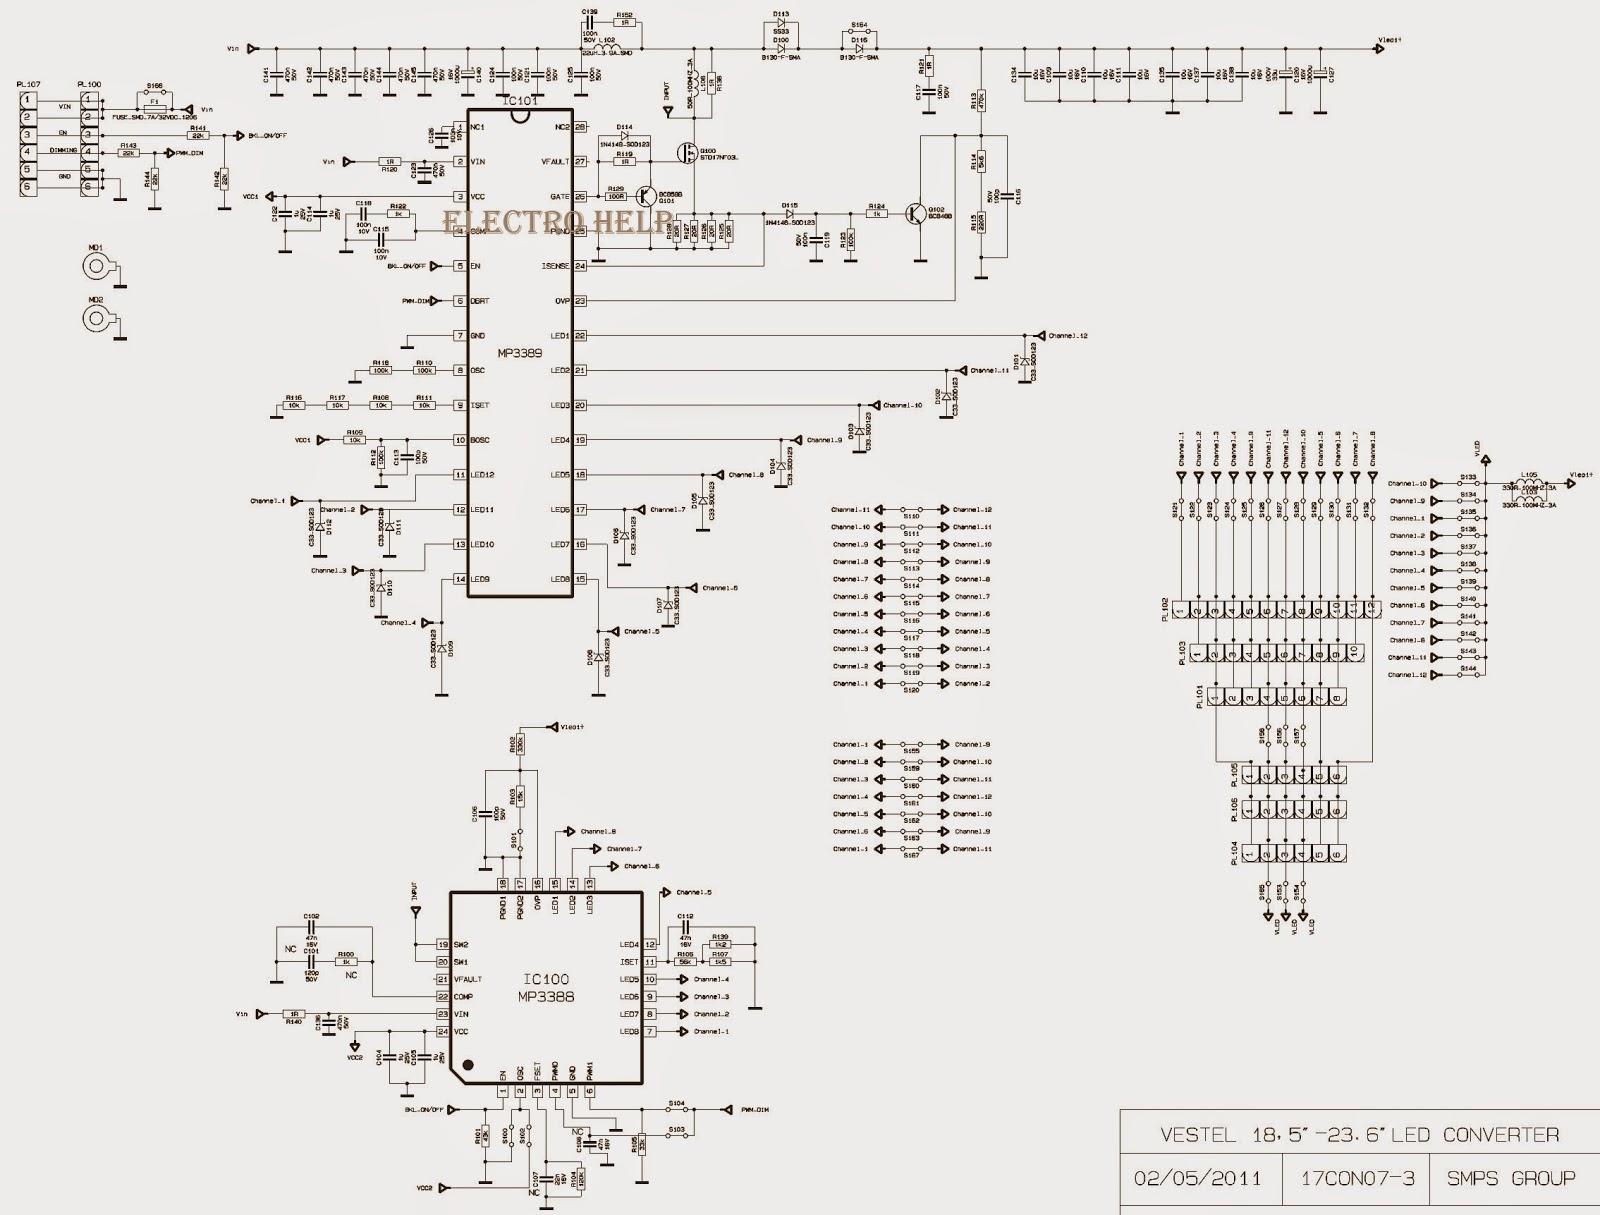 DIAGRAM] Tv Vestel Schematic Diagram FULL Version HD Quality